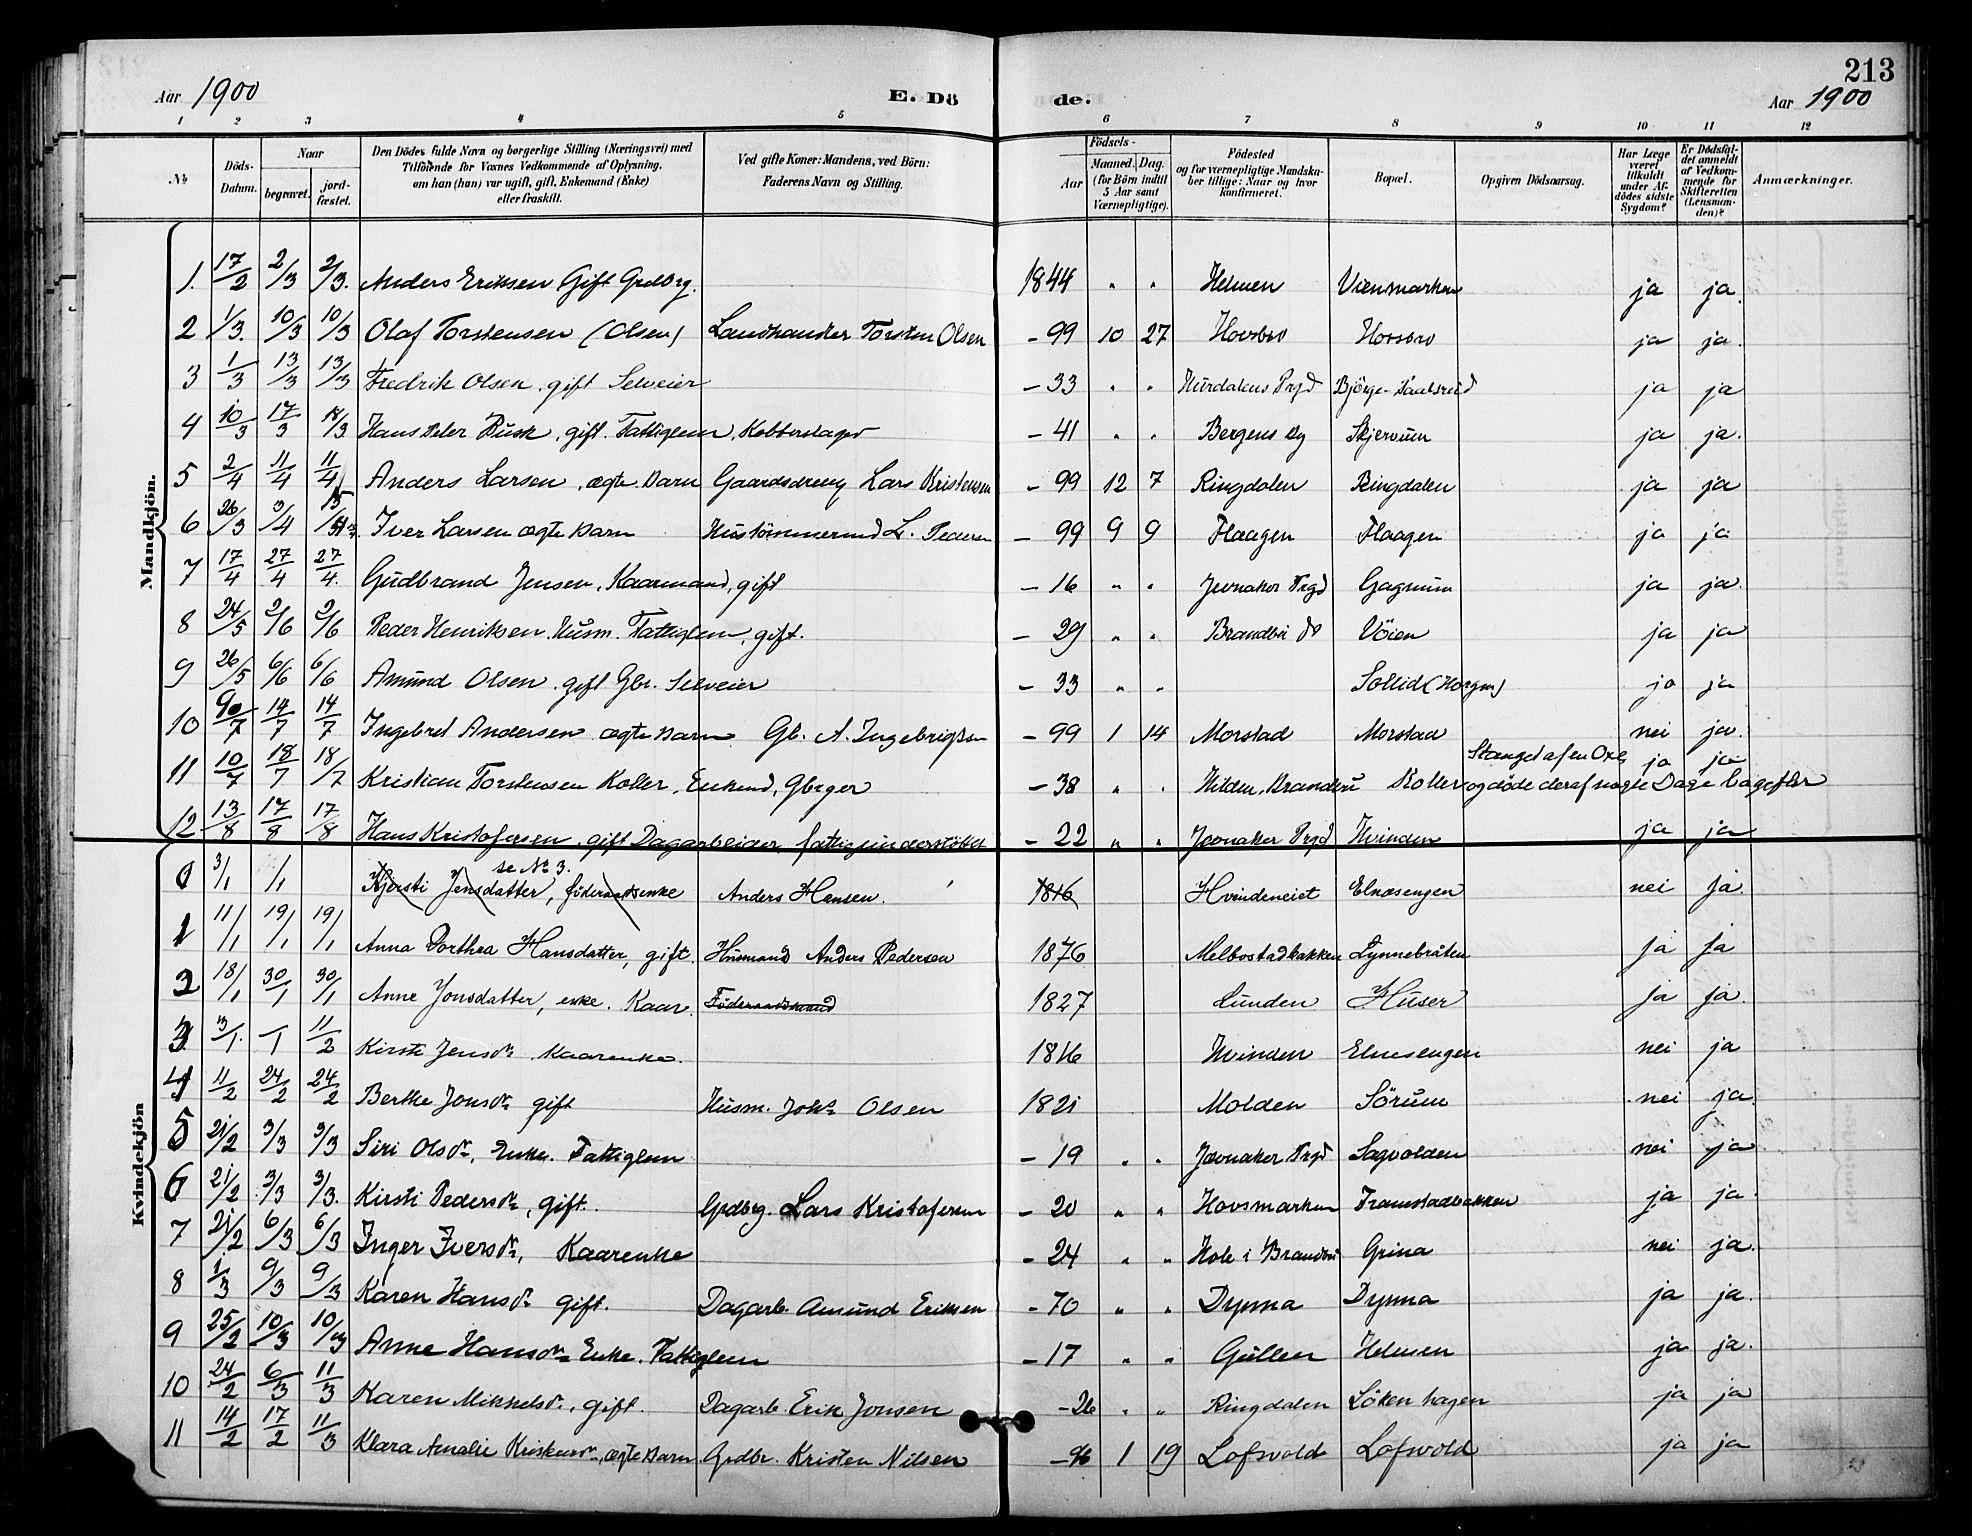 SAH, Gran prestekontor, Ministerialbok nr. 19, 1898-1907, s. 213